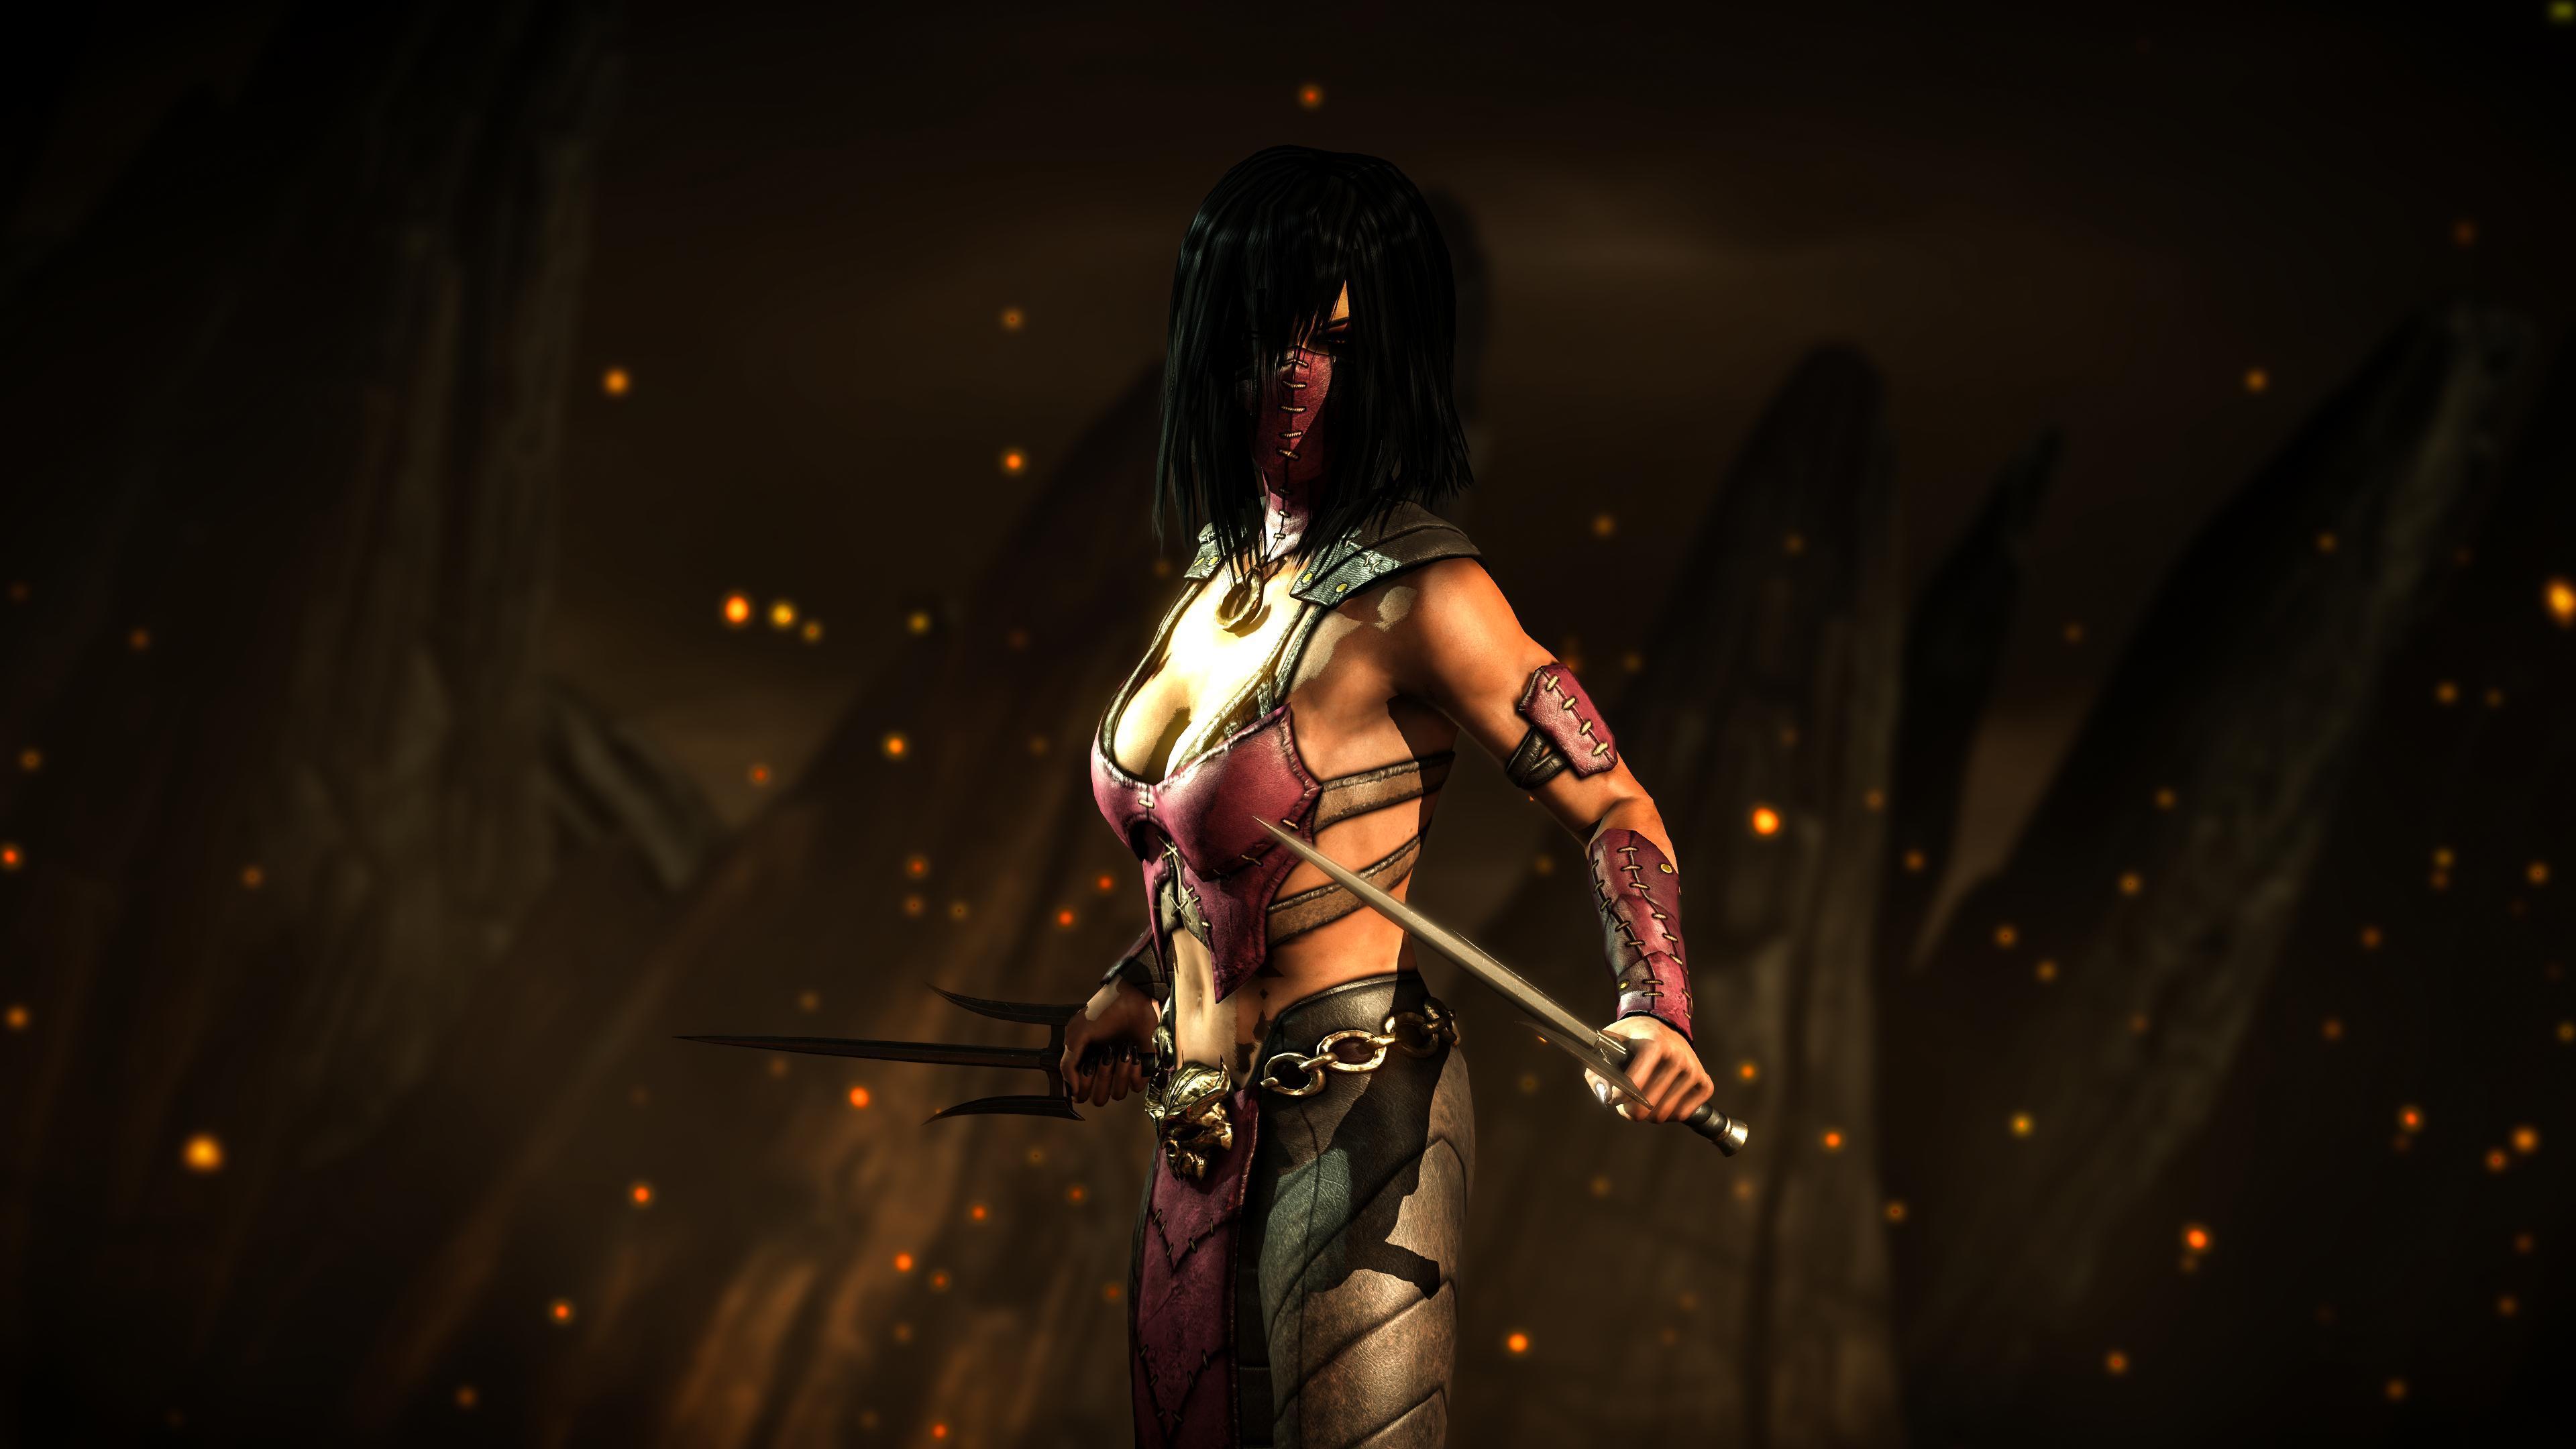 Mortal Kombat Mileena Wallpapers Wallpaper Cave